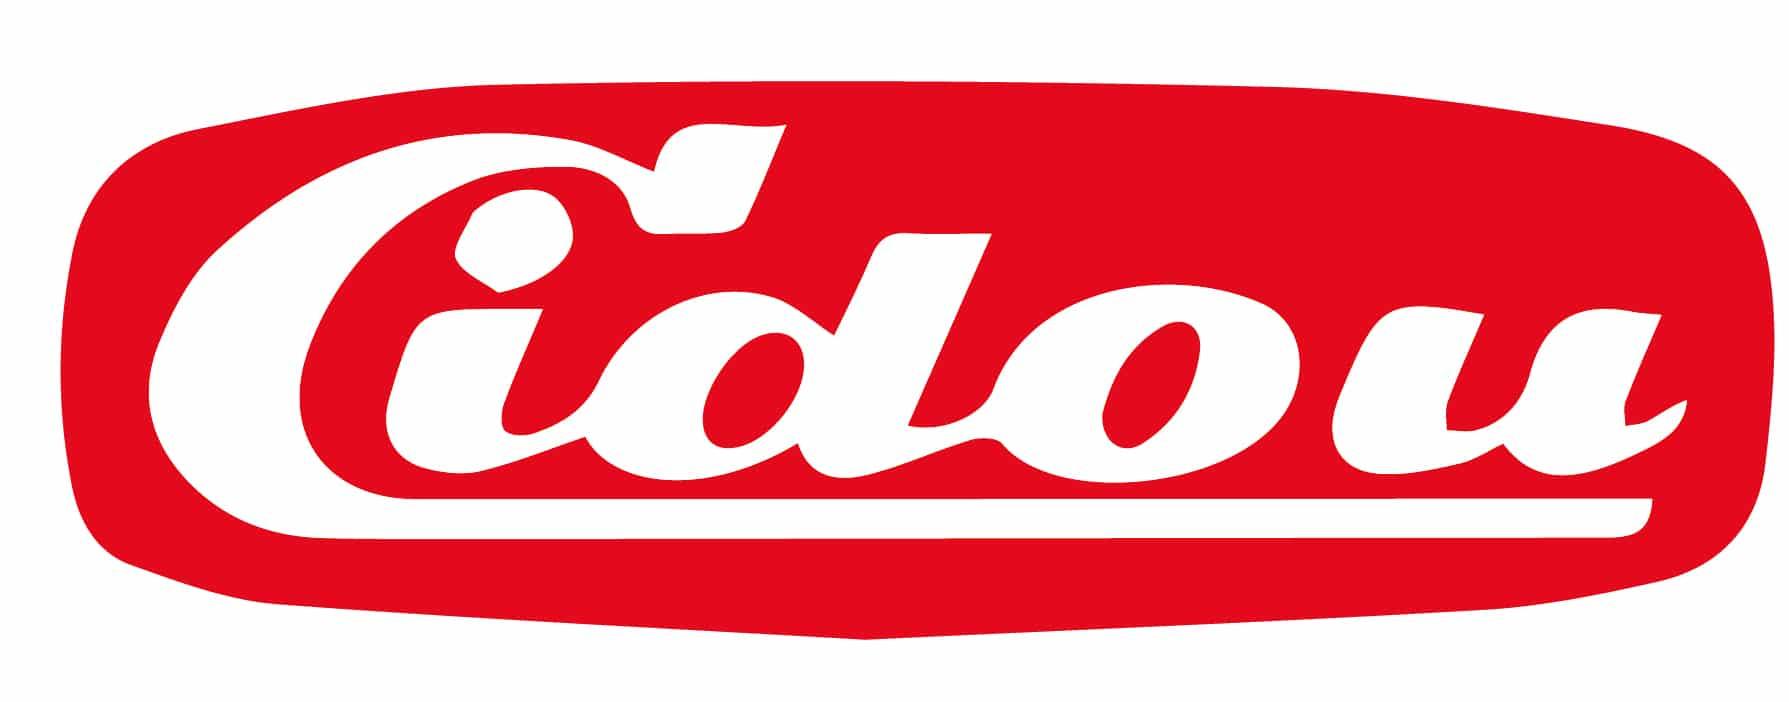 logo cidou 1978